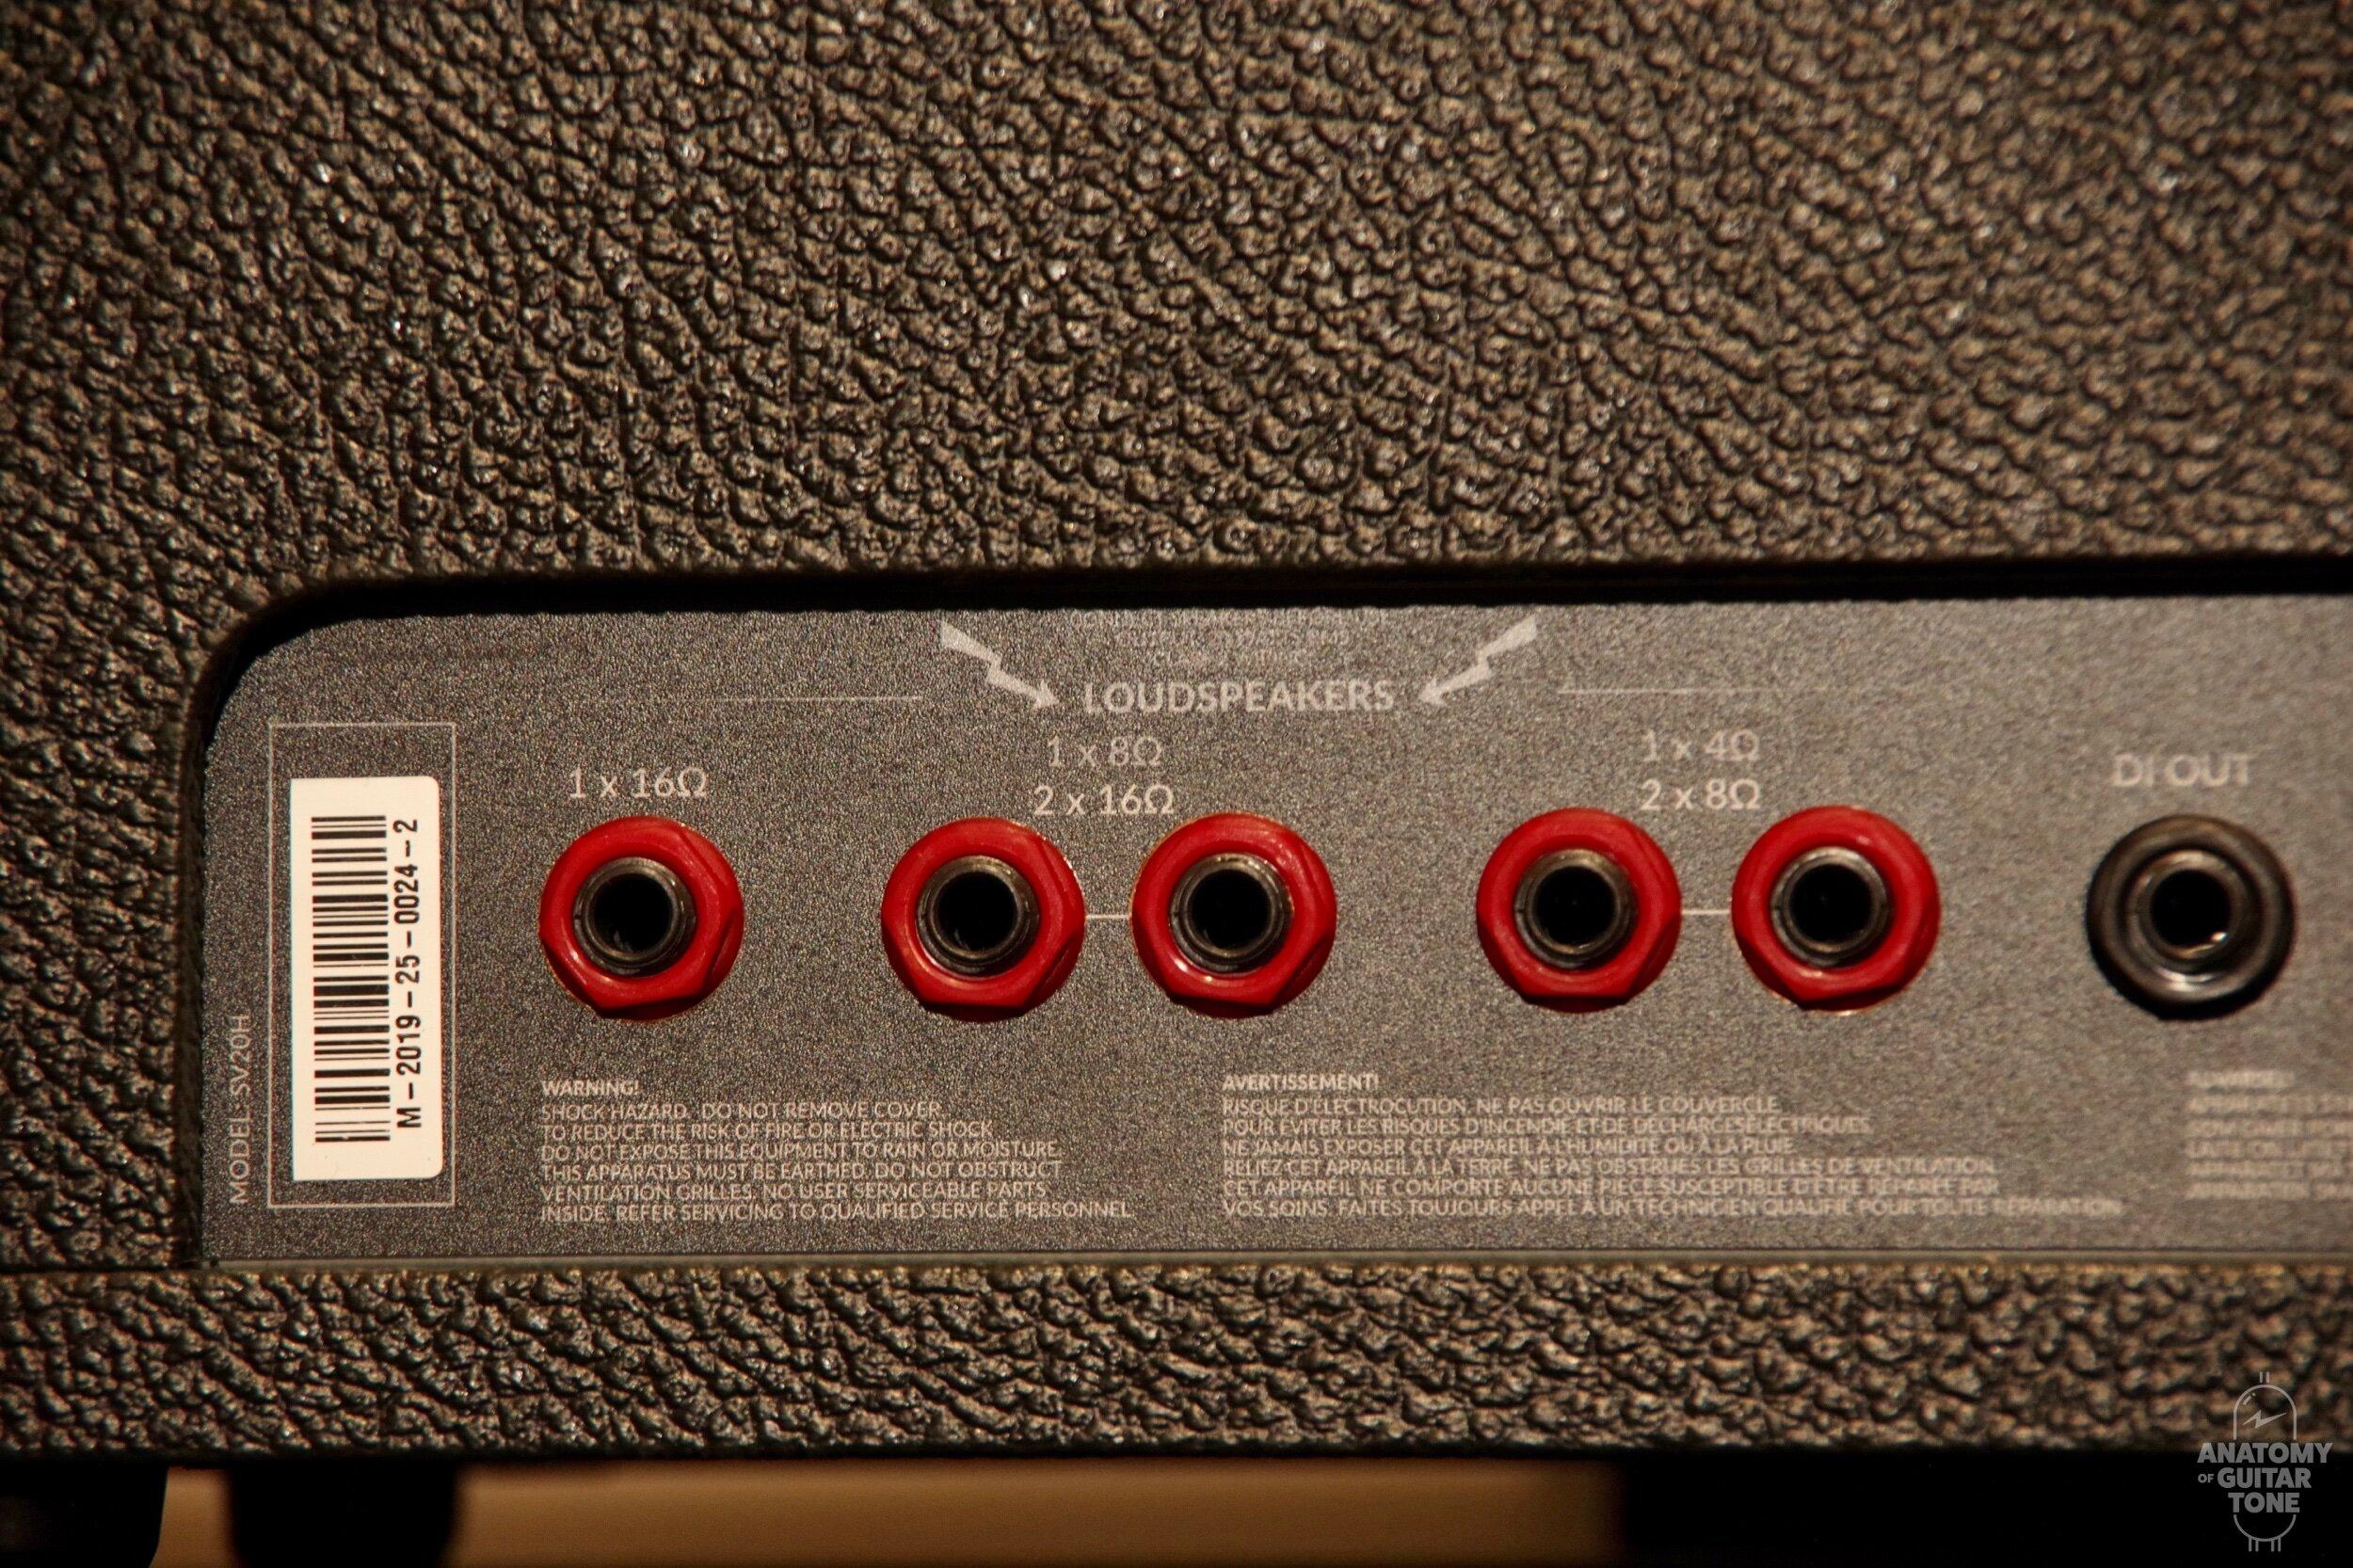 Rear panel of Marshall SV20H anatomy of guitar tone .jpeg